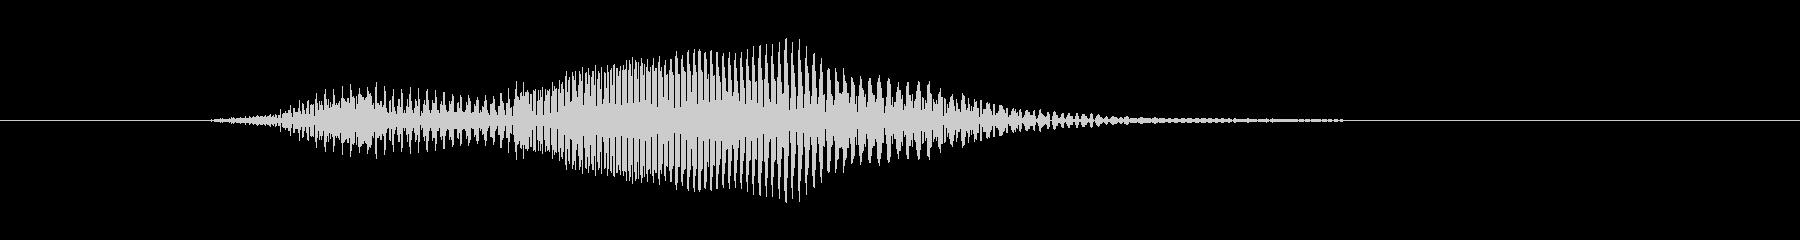 Hello(ハロウ・ハロー)の未再生の波形